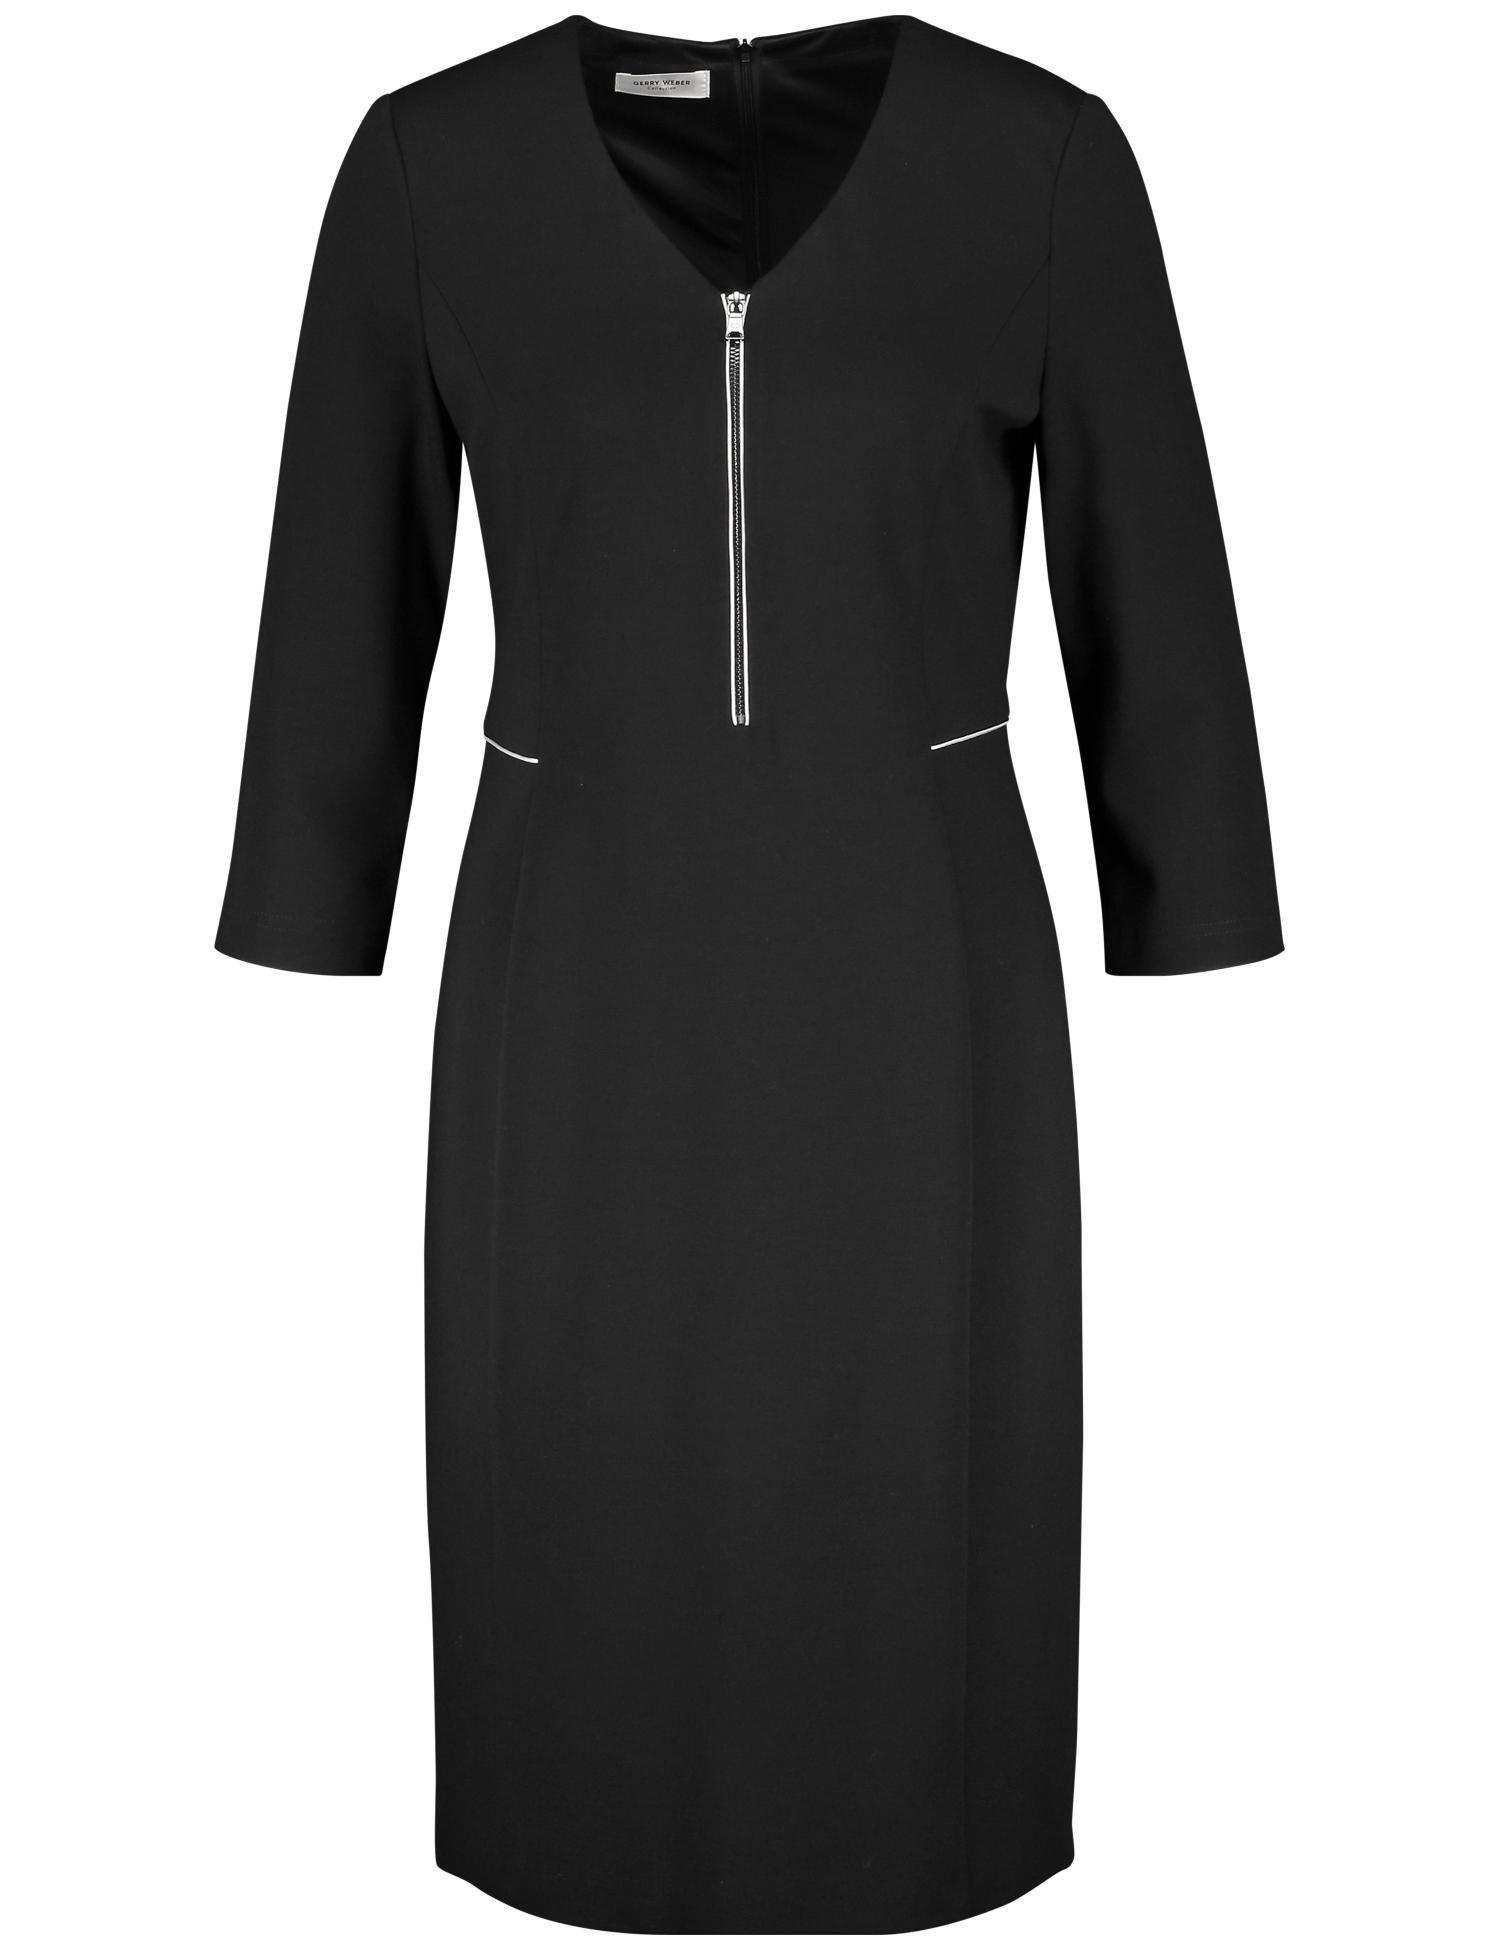 GERRY WEBER Kleid Gewebe »Kleid mit Frontzip«